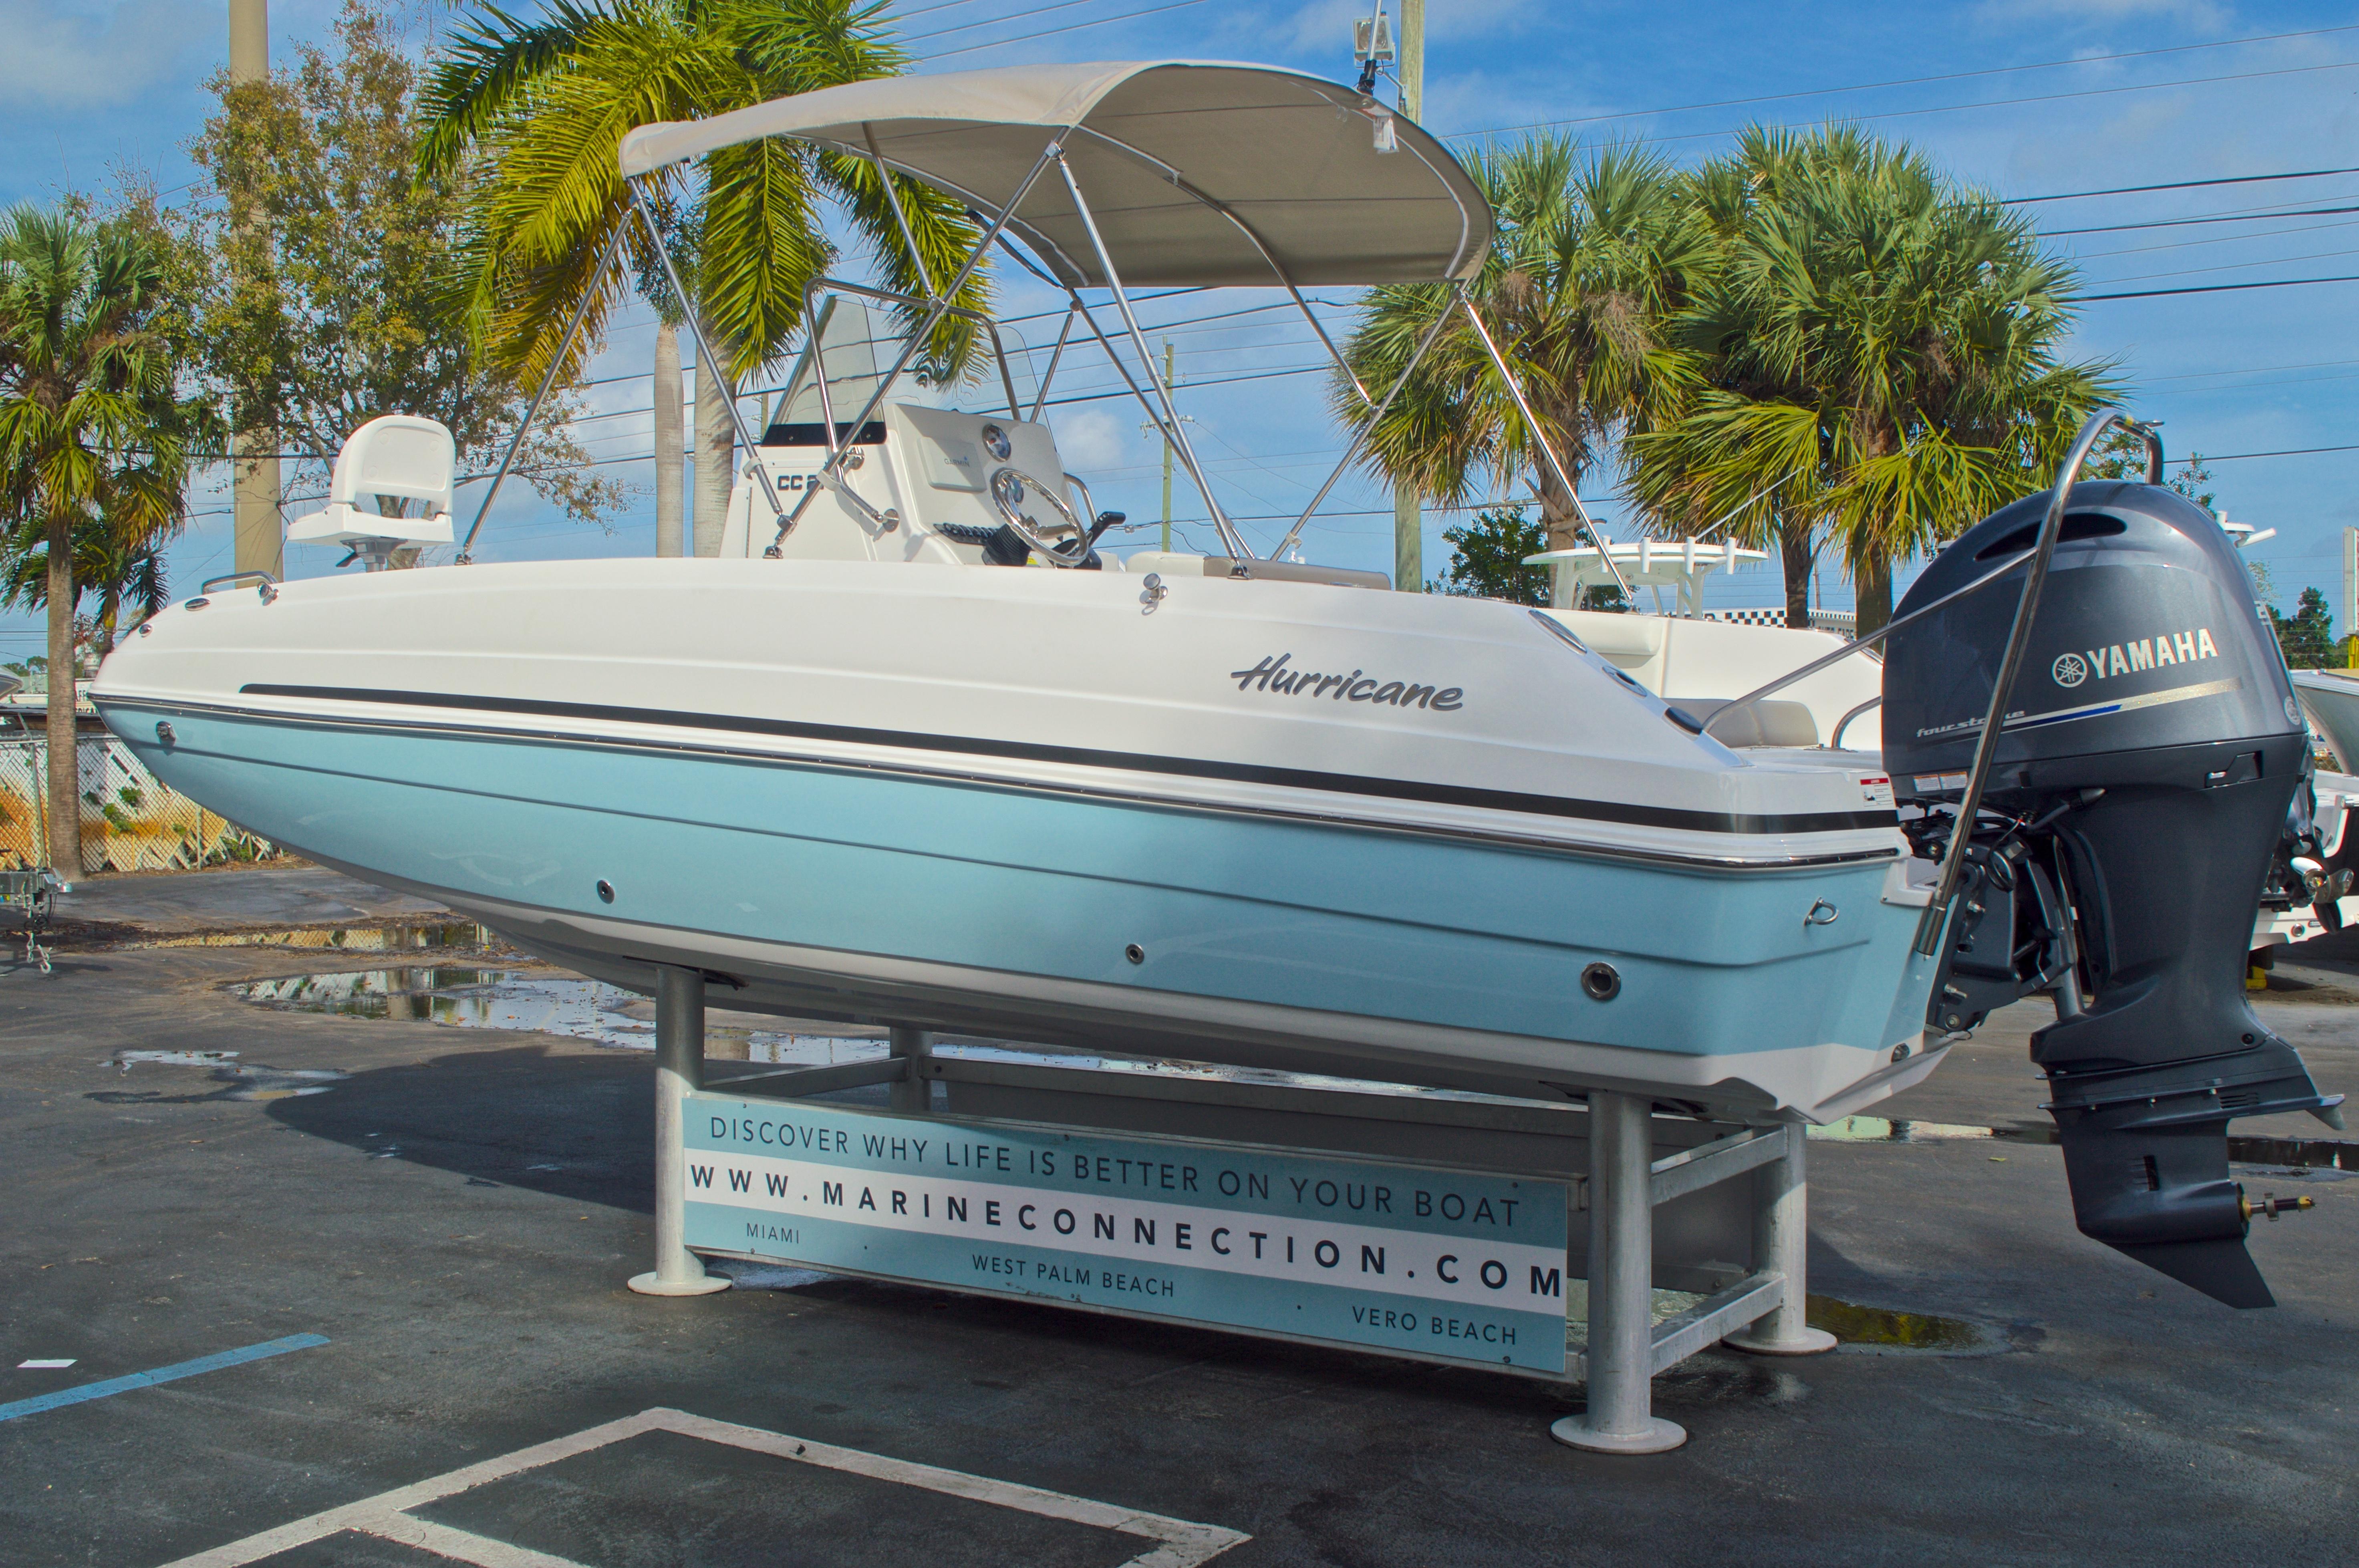 Thumbnail 7 for New 2016 Hurricane CC21 Center Console boat for sale in Vero Beach, FL